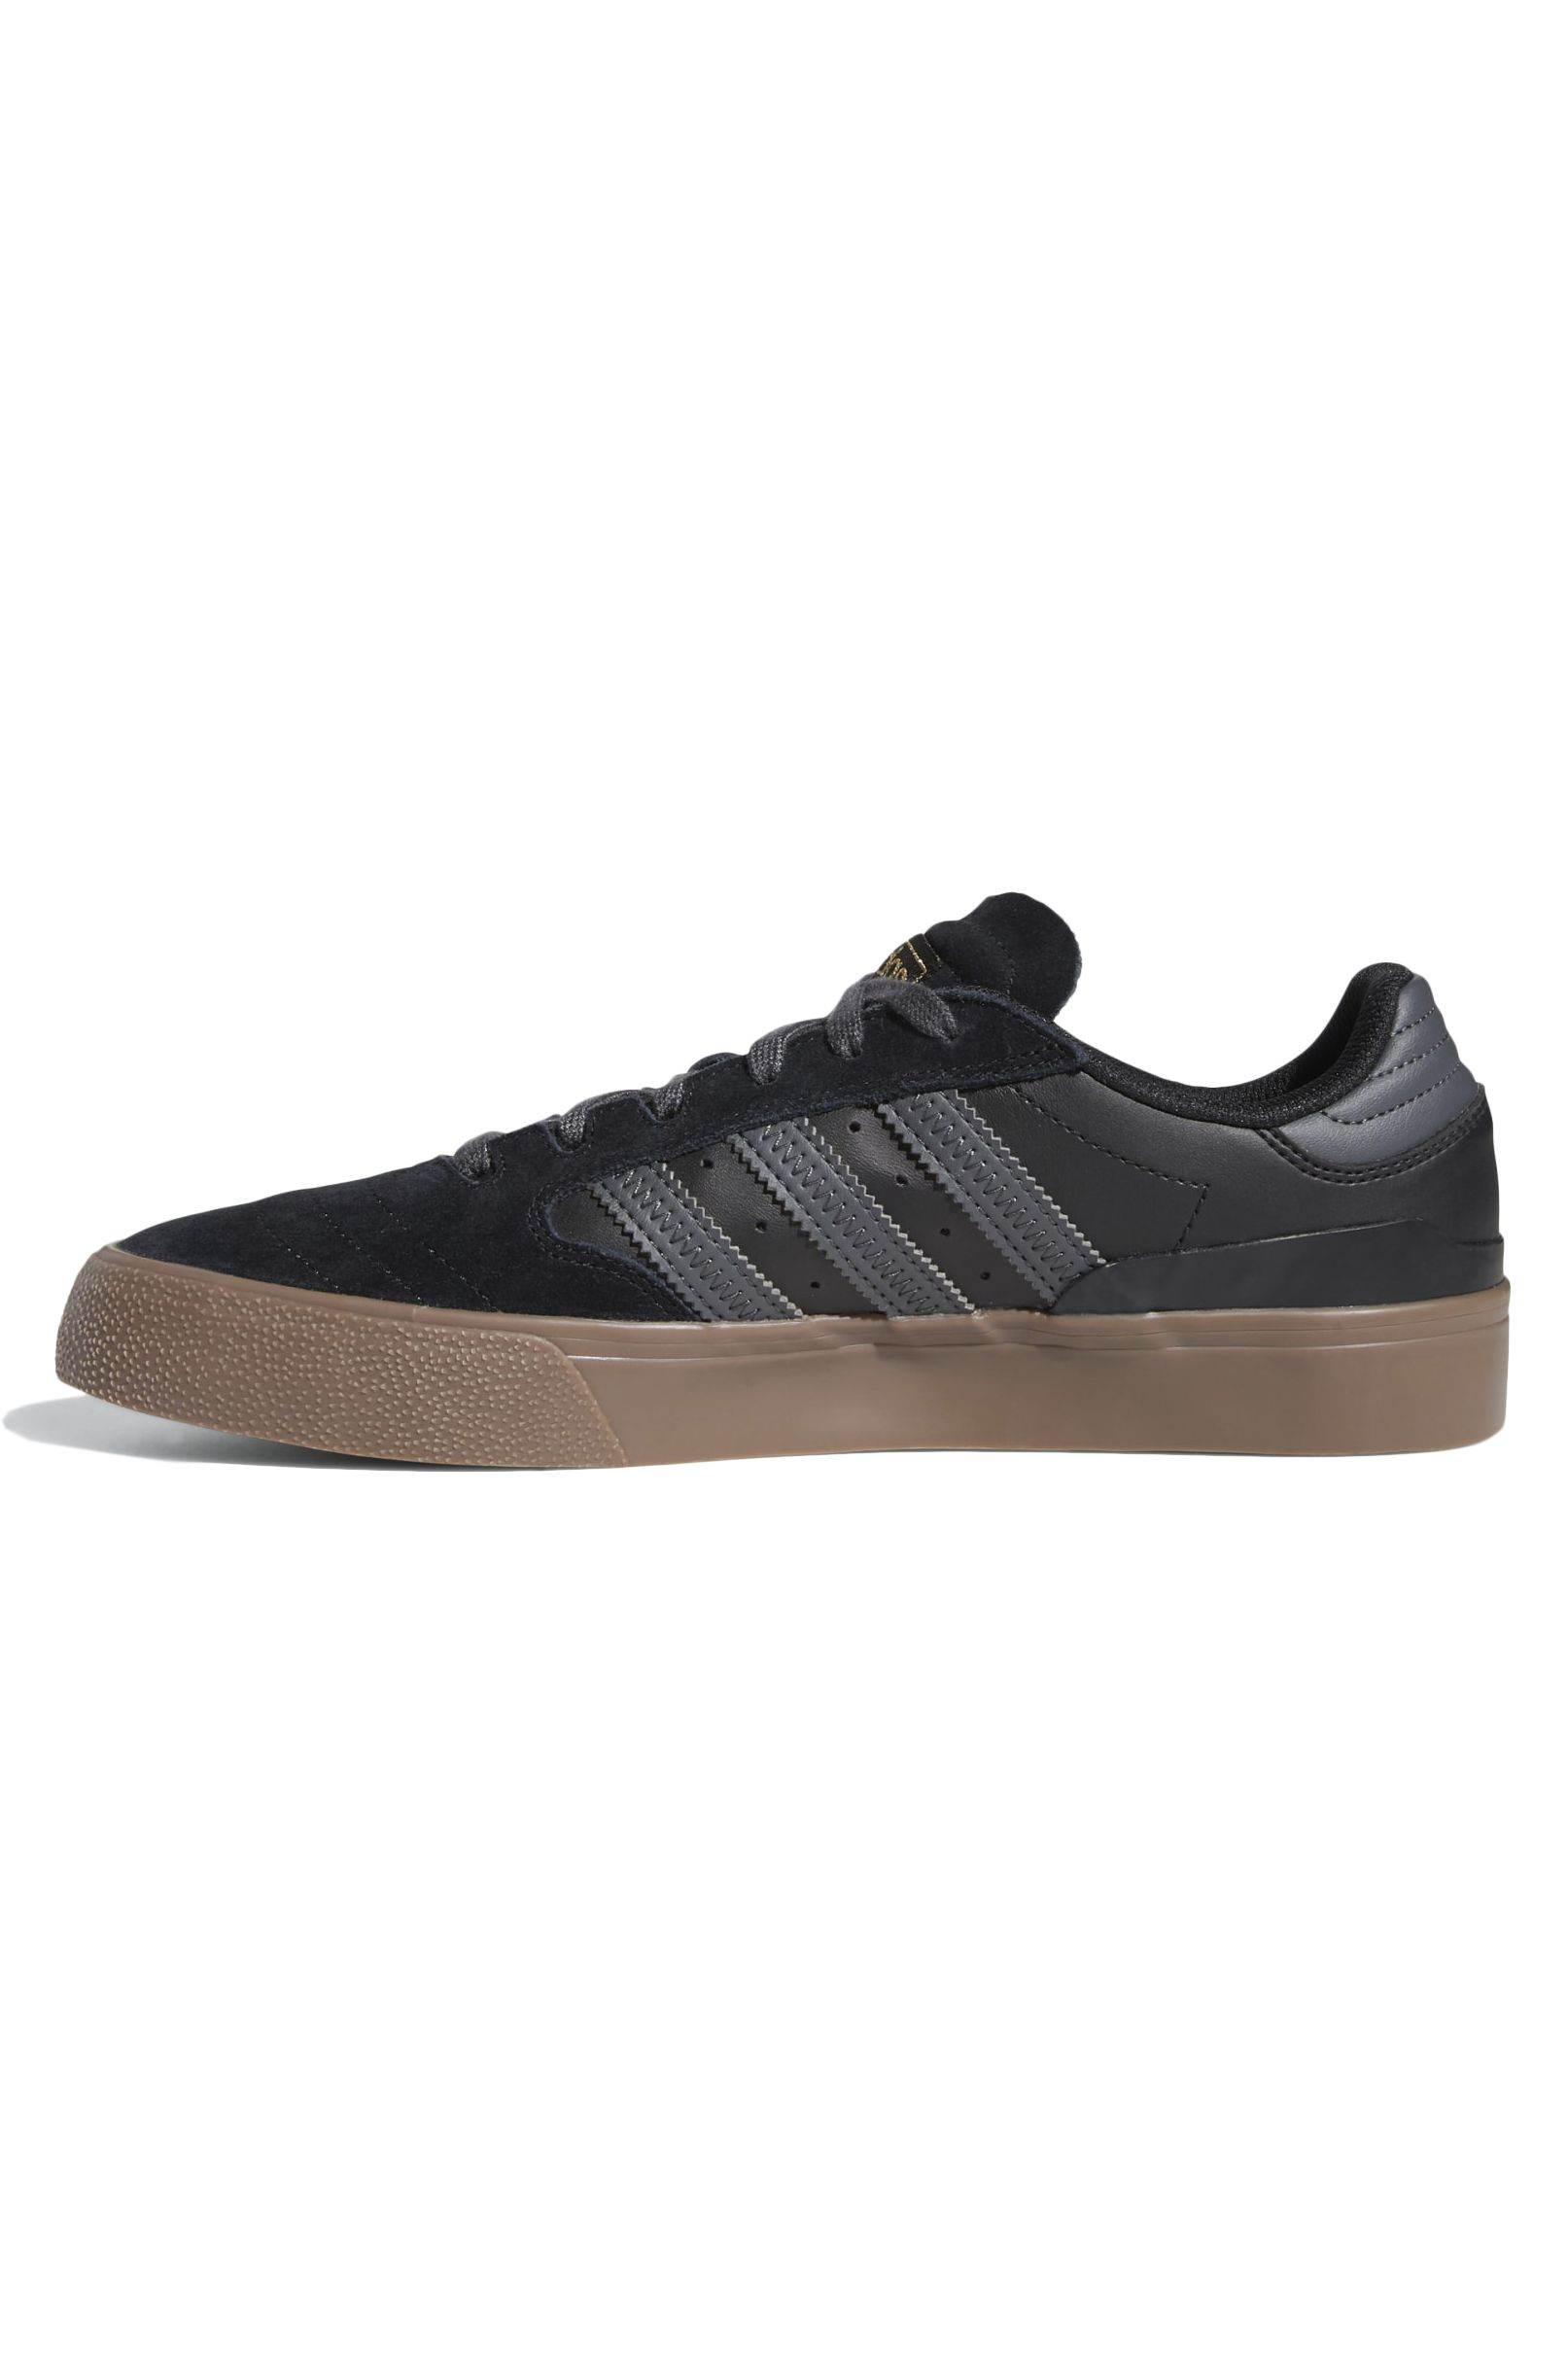 Tenis Adidas BUSENITZ VULC II Core Black/Grey Six/Gum5